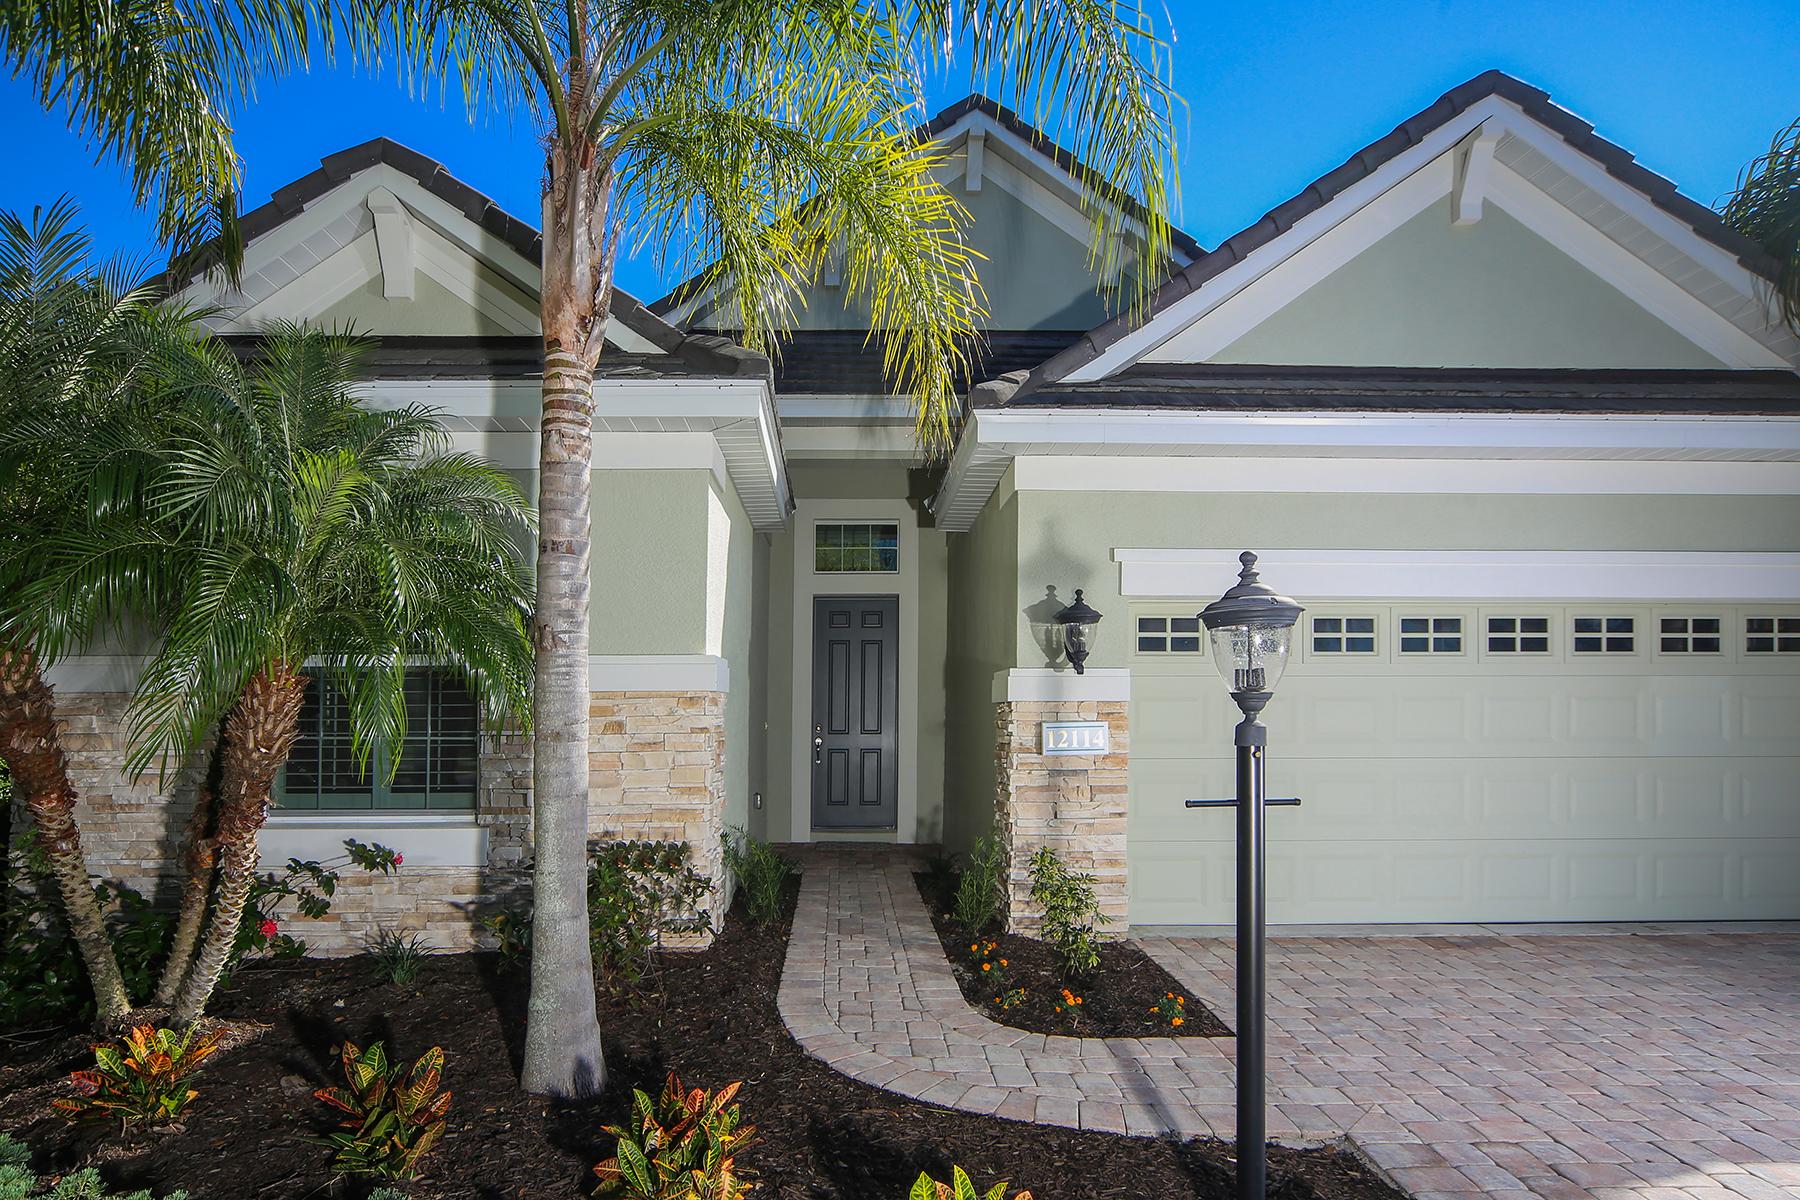 واحد منزل الأسرة للـ Sale في LAKEWOOD RANCH COUNTRY CLUB 12114 Thornhill Ct, Lakewood Ranch, Florida, 34202 United States